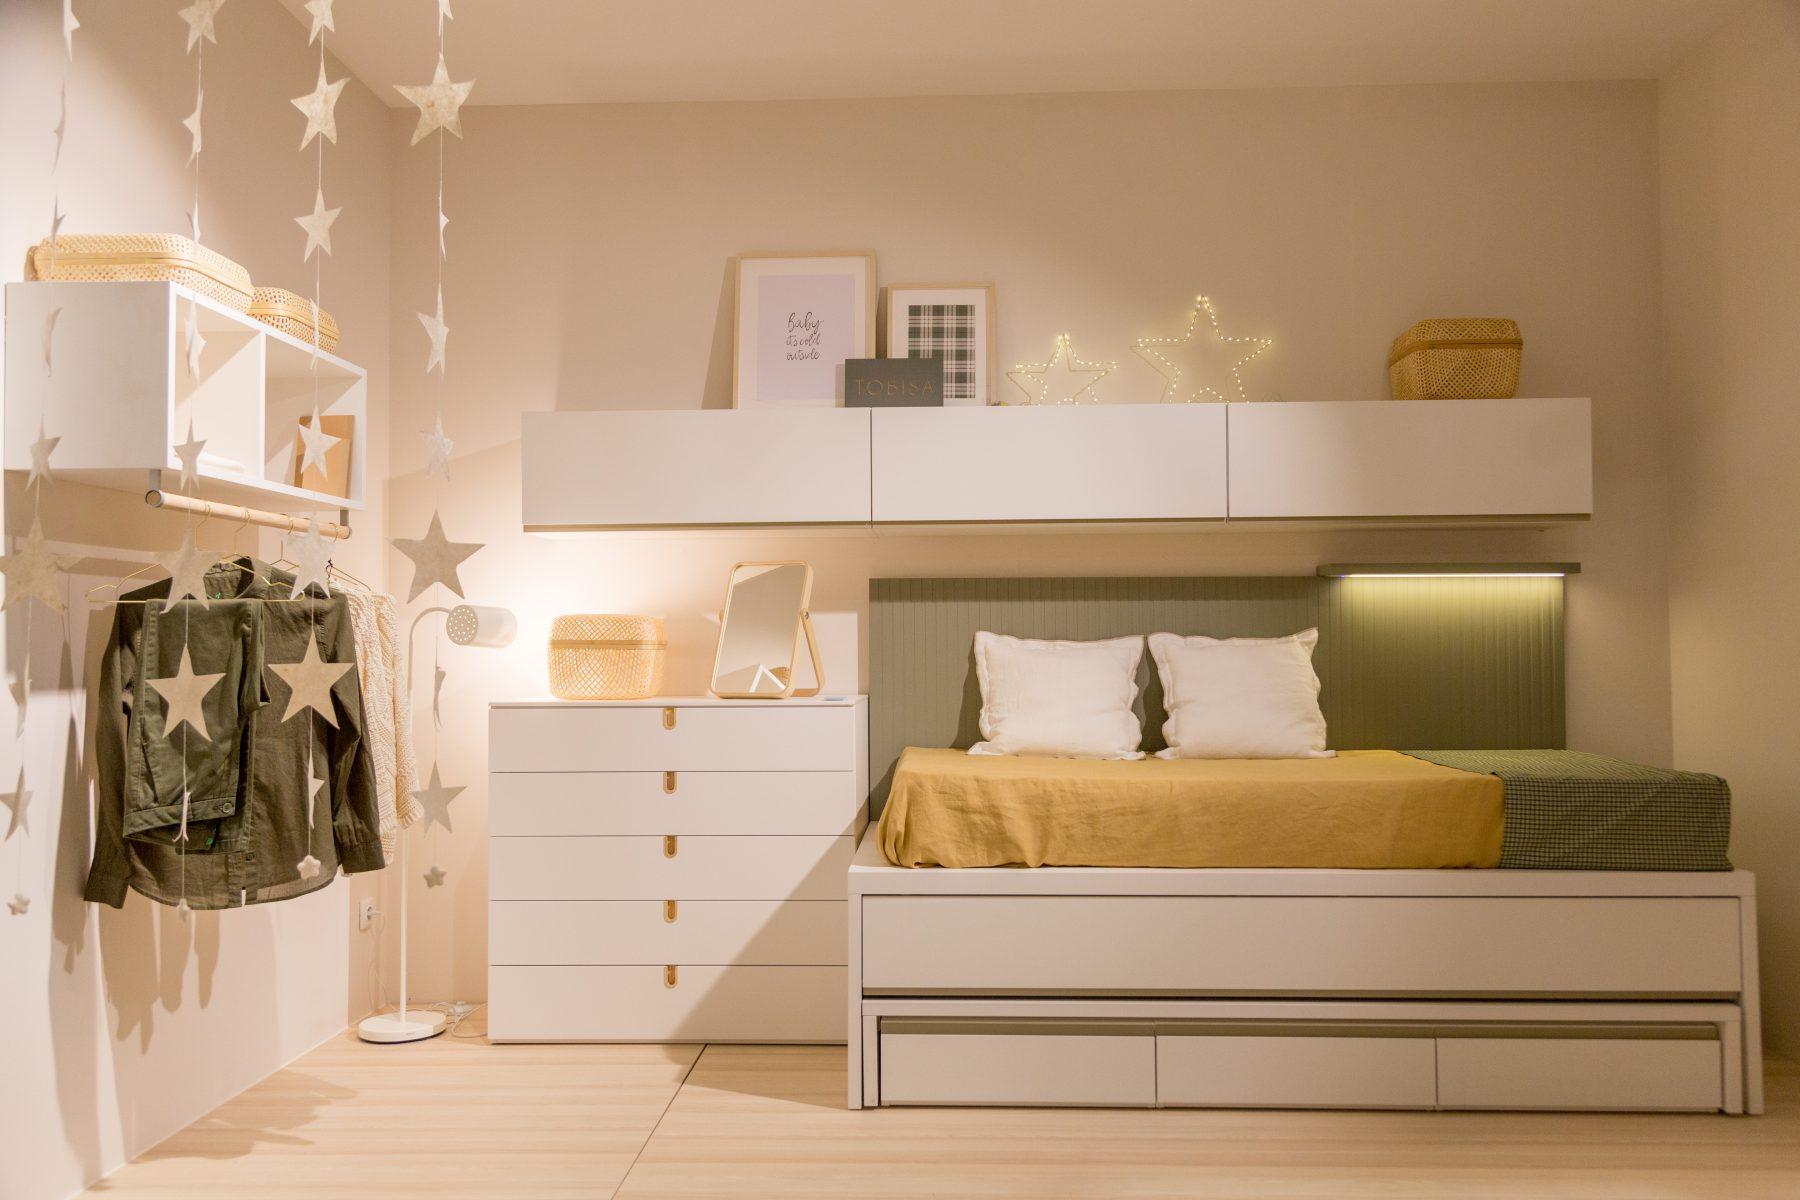 tobisa muebles a medida habitaciones infantiles dormitorios juveniles feria habitat valencia 2018 (46)